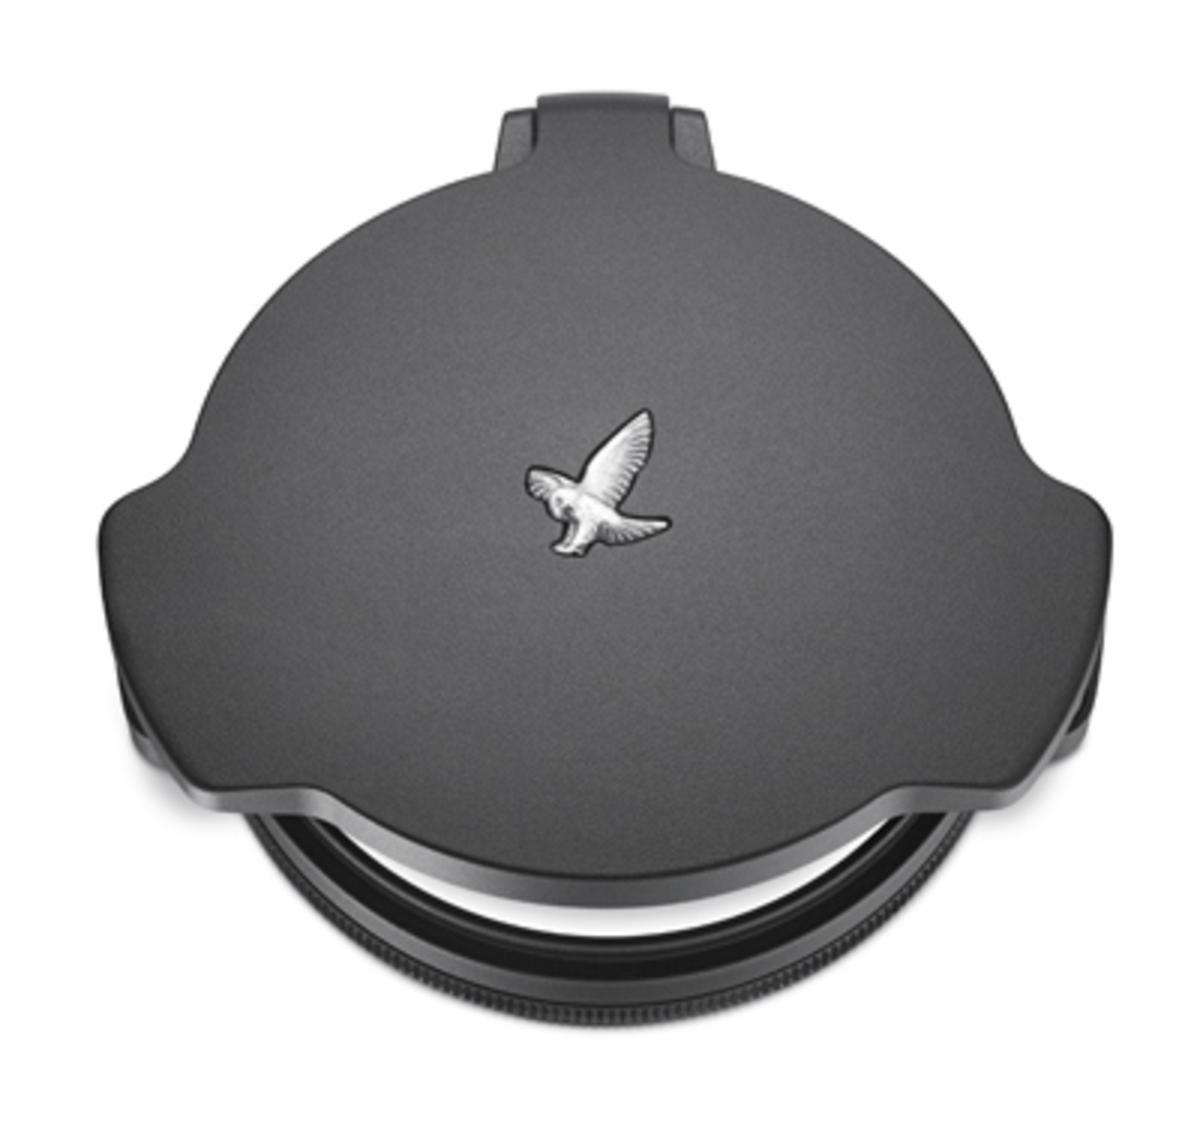 Swarovski SLP Scope Lens Protector New Gen II